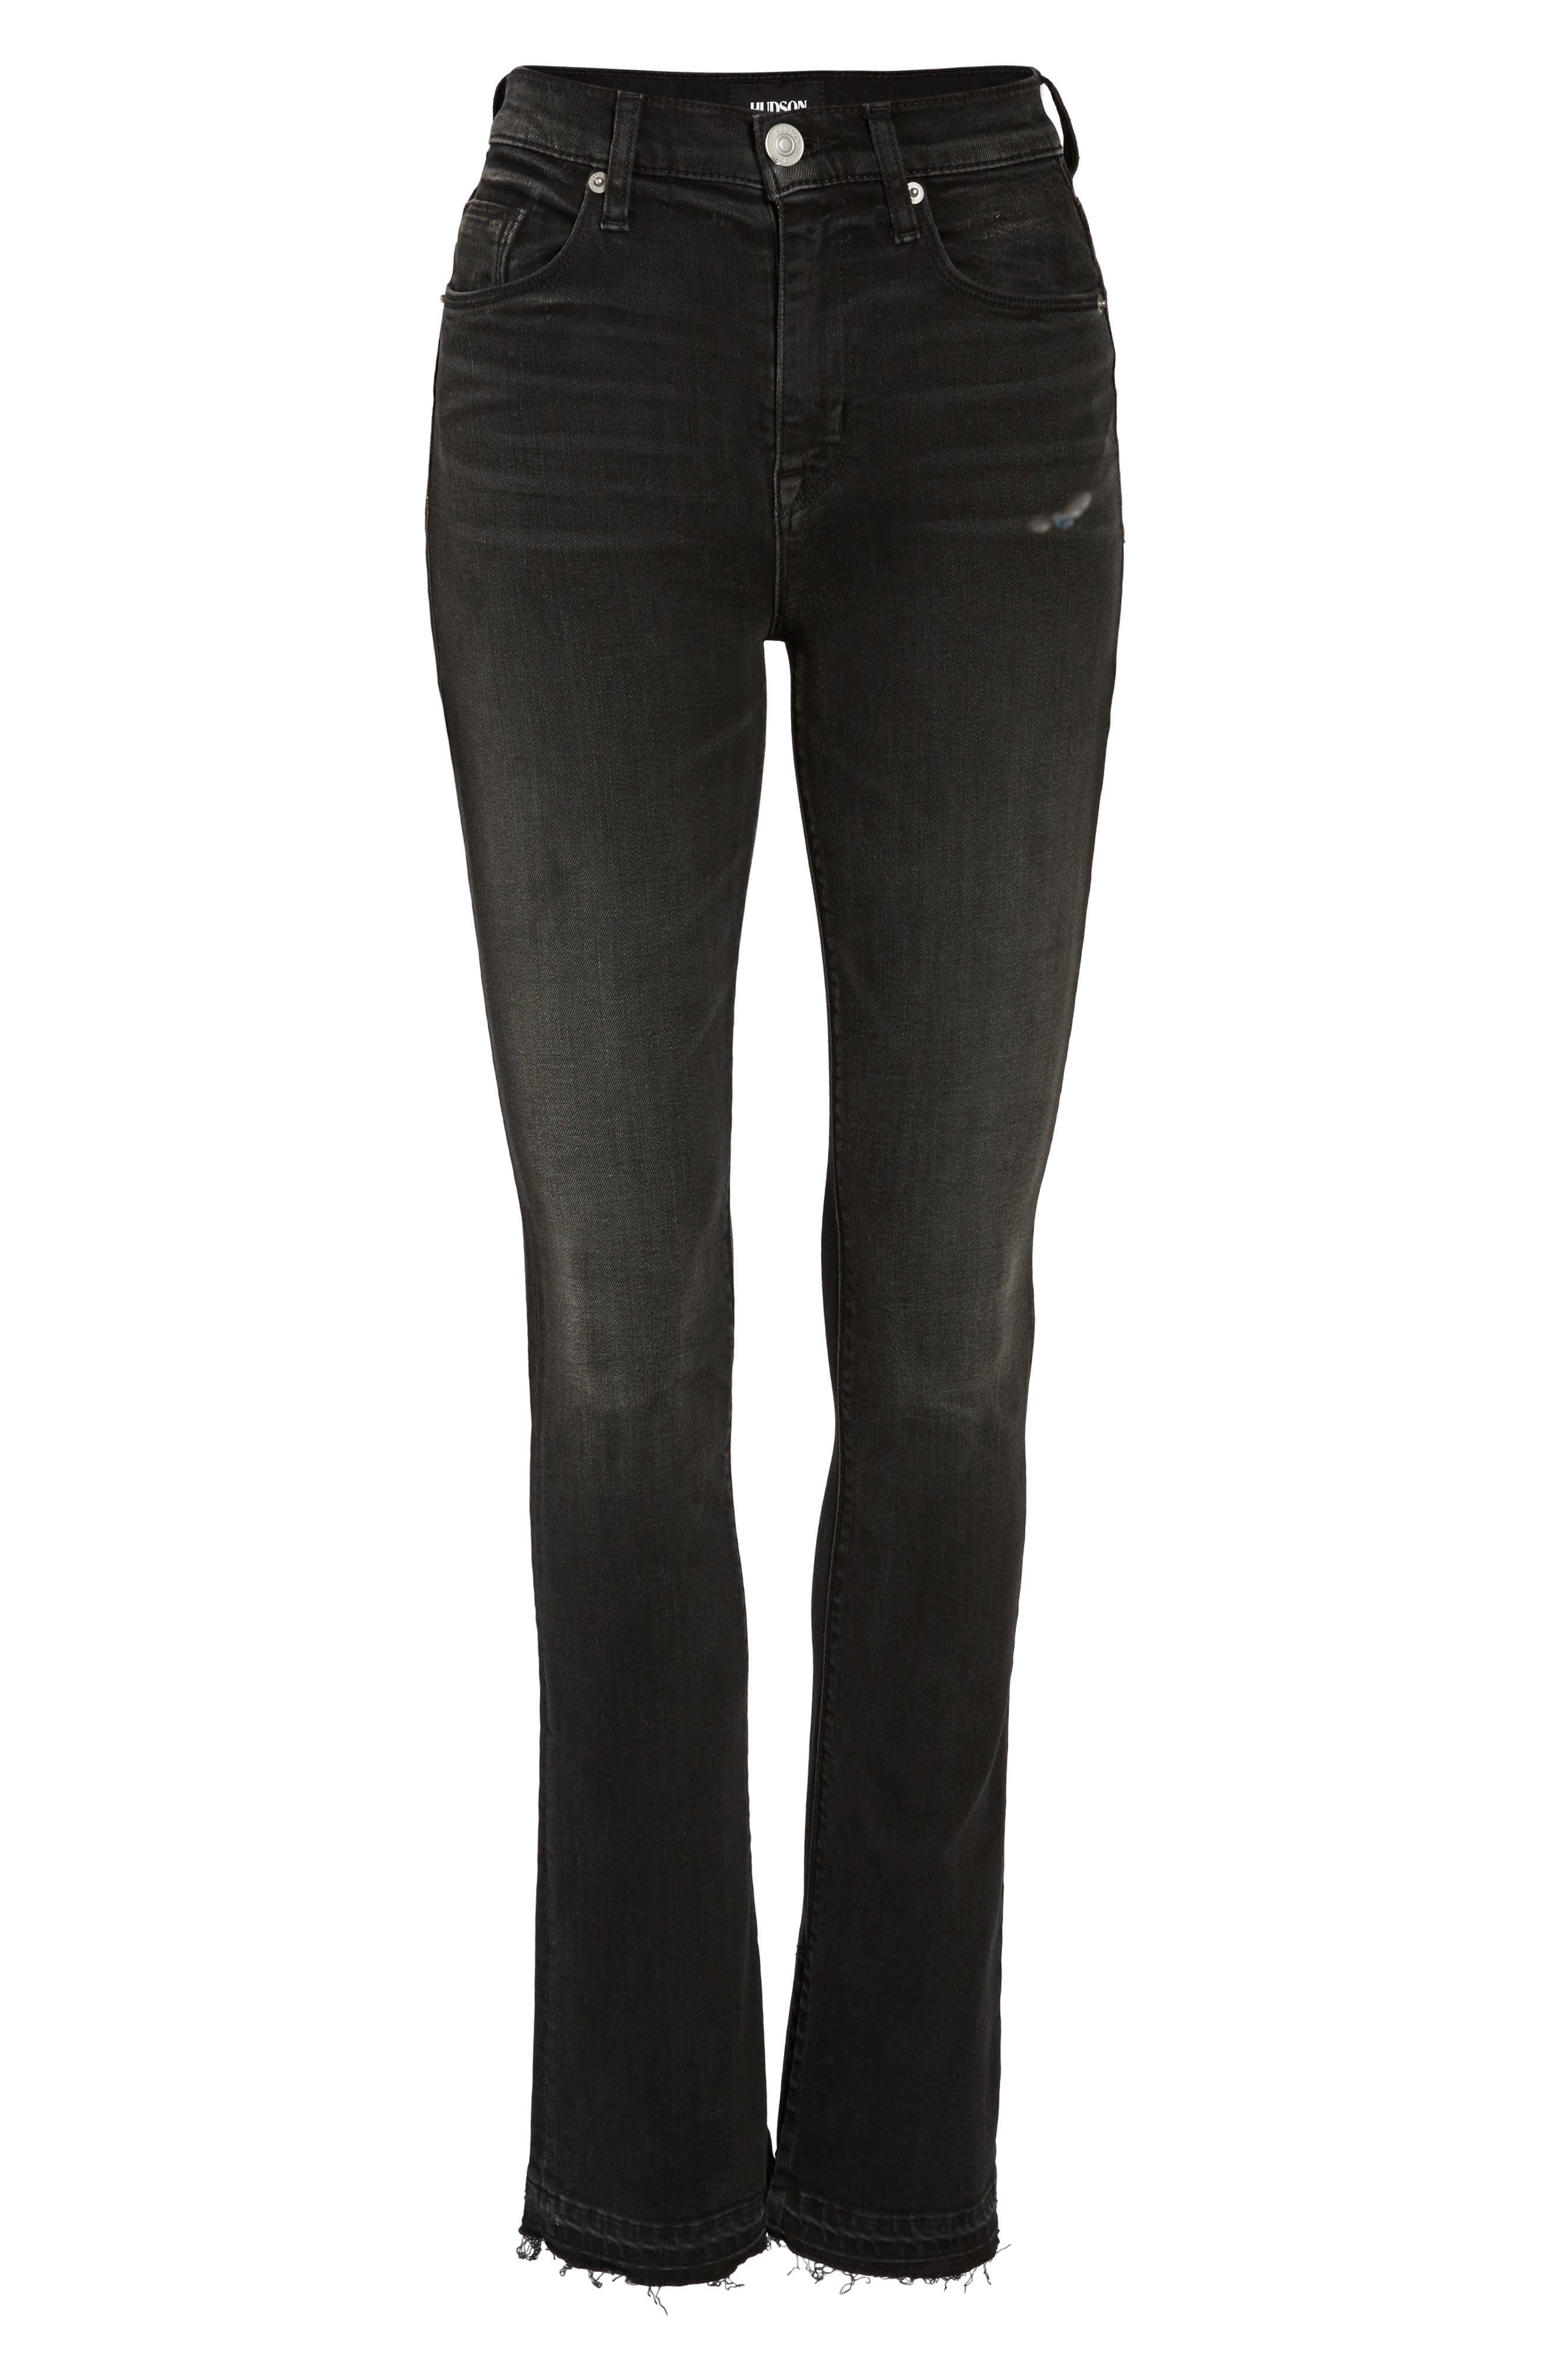 Heartbreaker High Waist Bootcut Jeans,                             Alternate thumbnail 6, color,                             Abandon